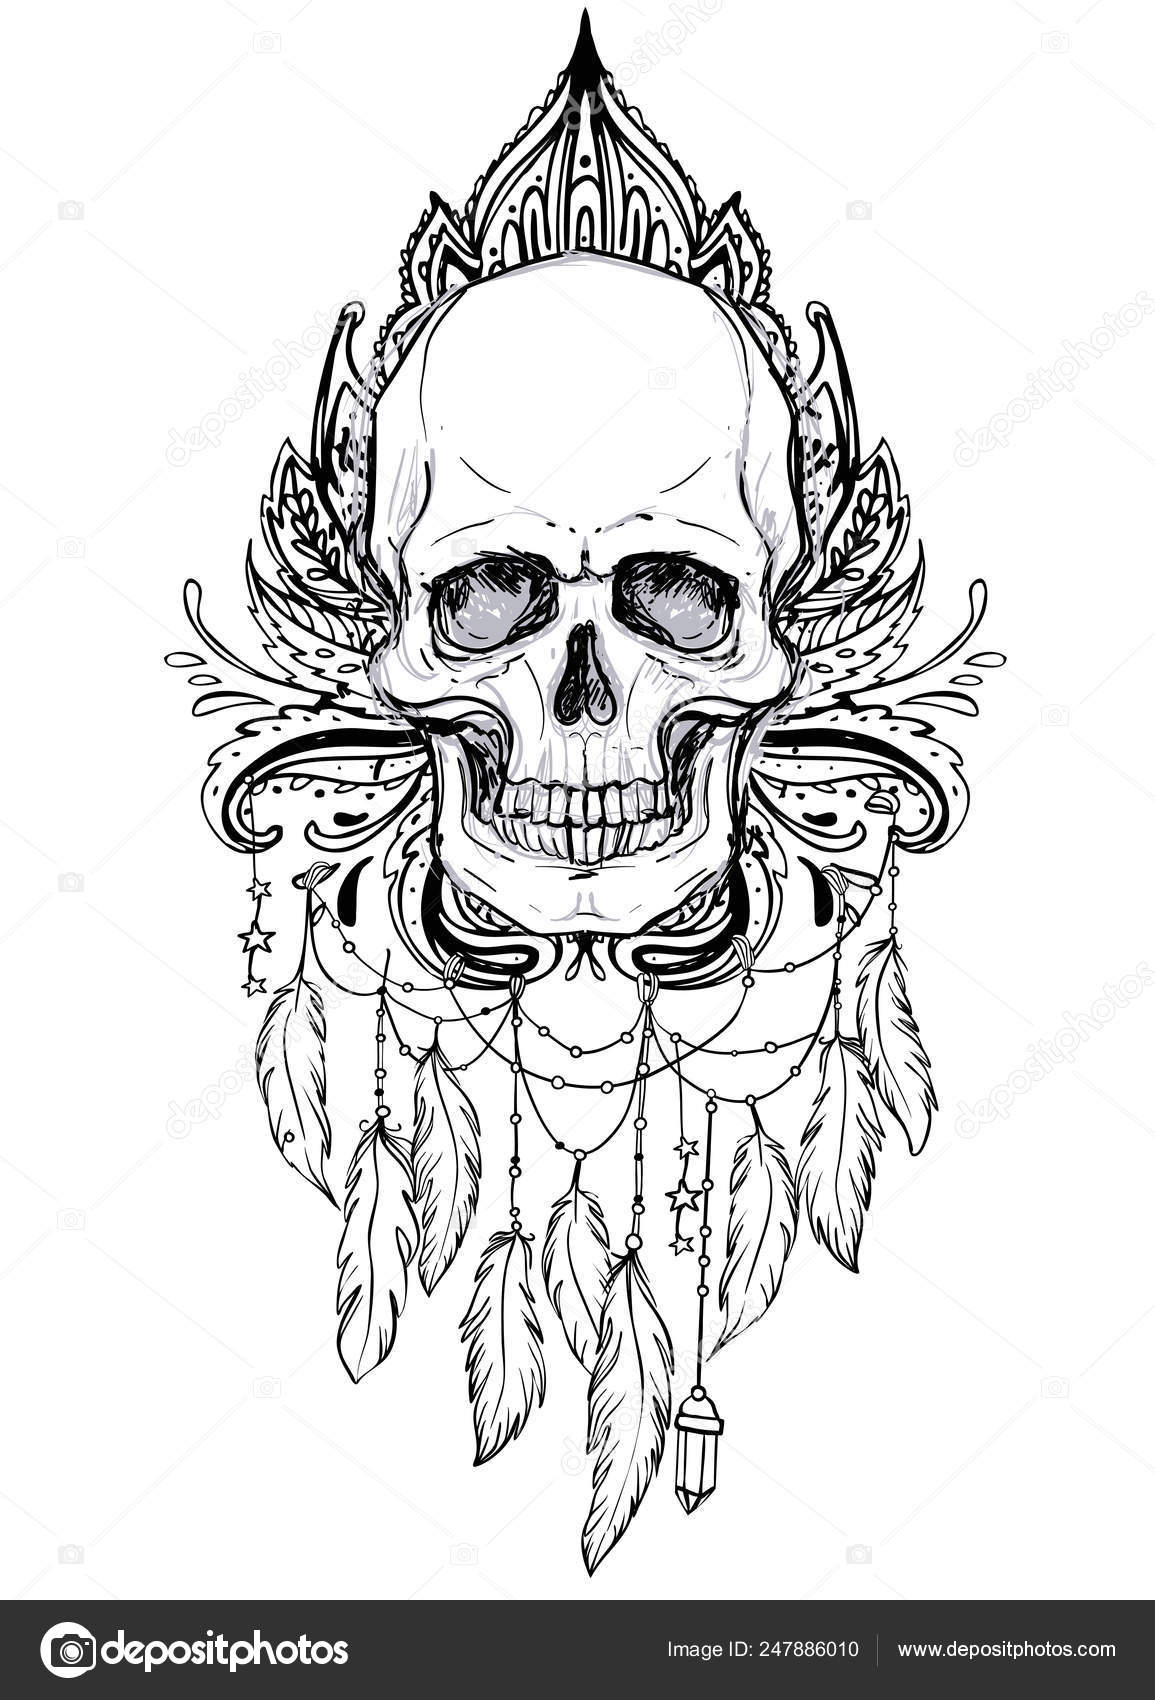 9c1deb1f3 Ayurveda symbol of harmony and balance. Tattoo flesh design, yoga logo.  Boho print, poster, t-shirt textile. Isolated vector illustration.